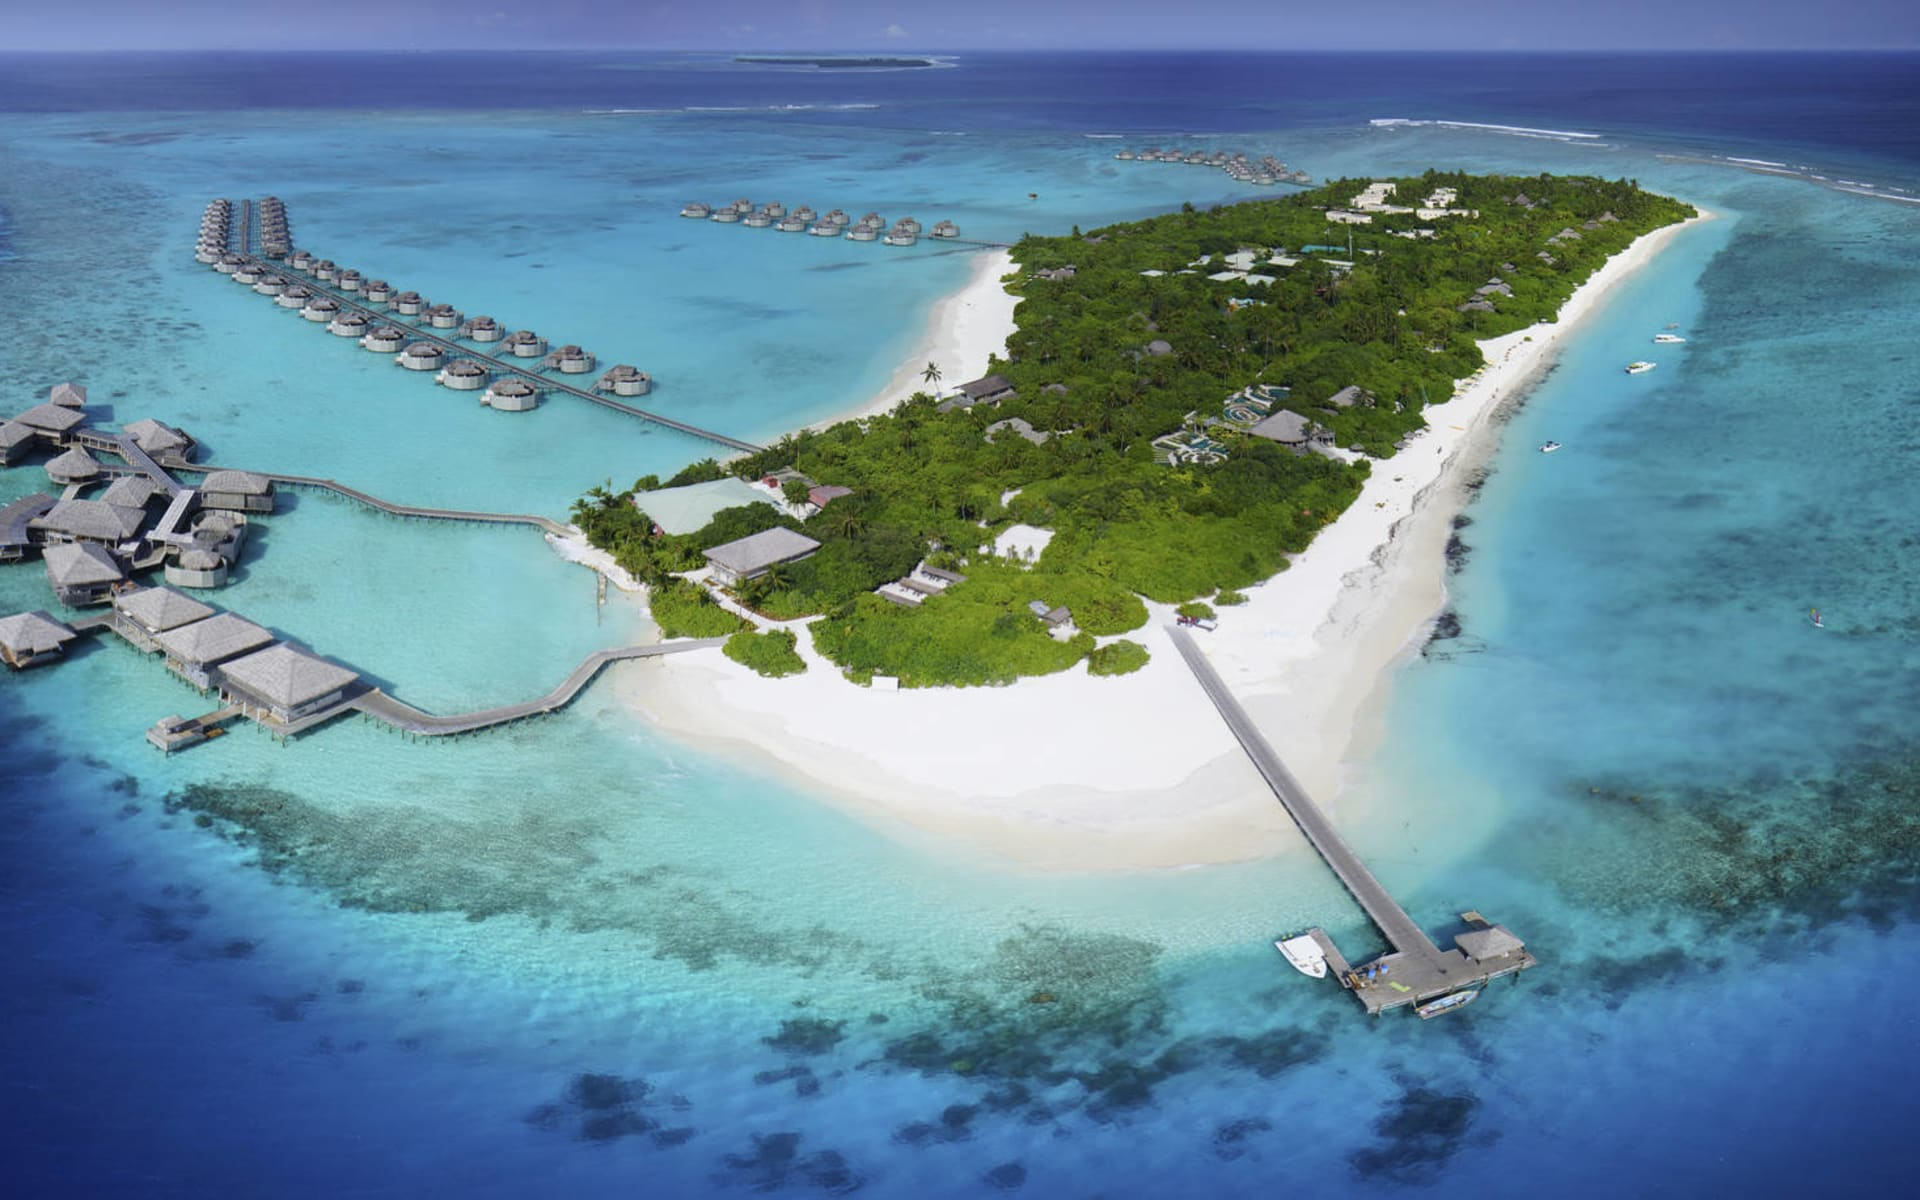 Six Senses Laamu in Laamu-Atoll:  Six Senses Laamu - Laamu-Atoll